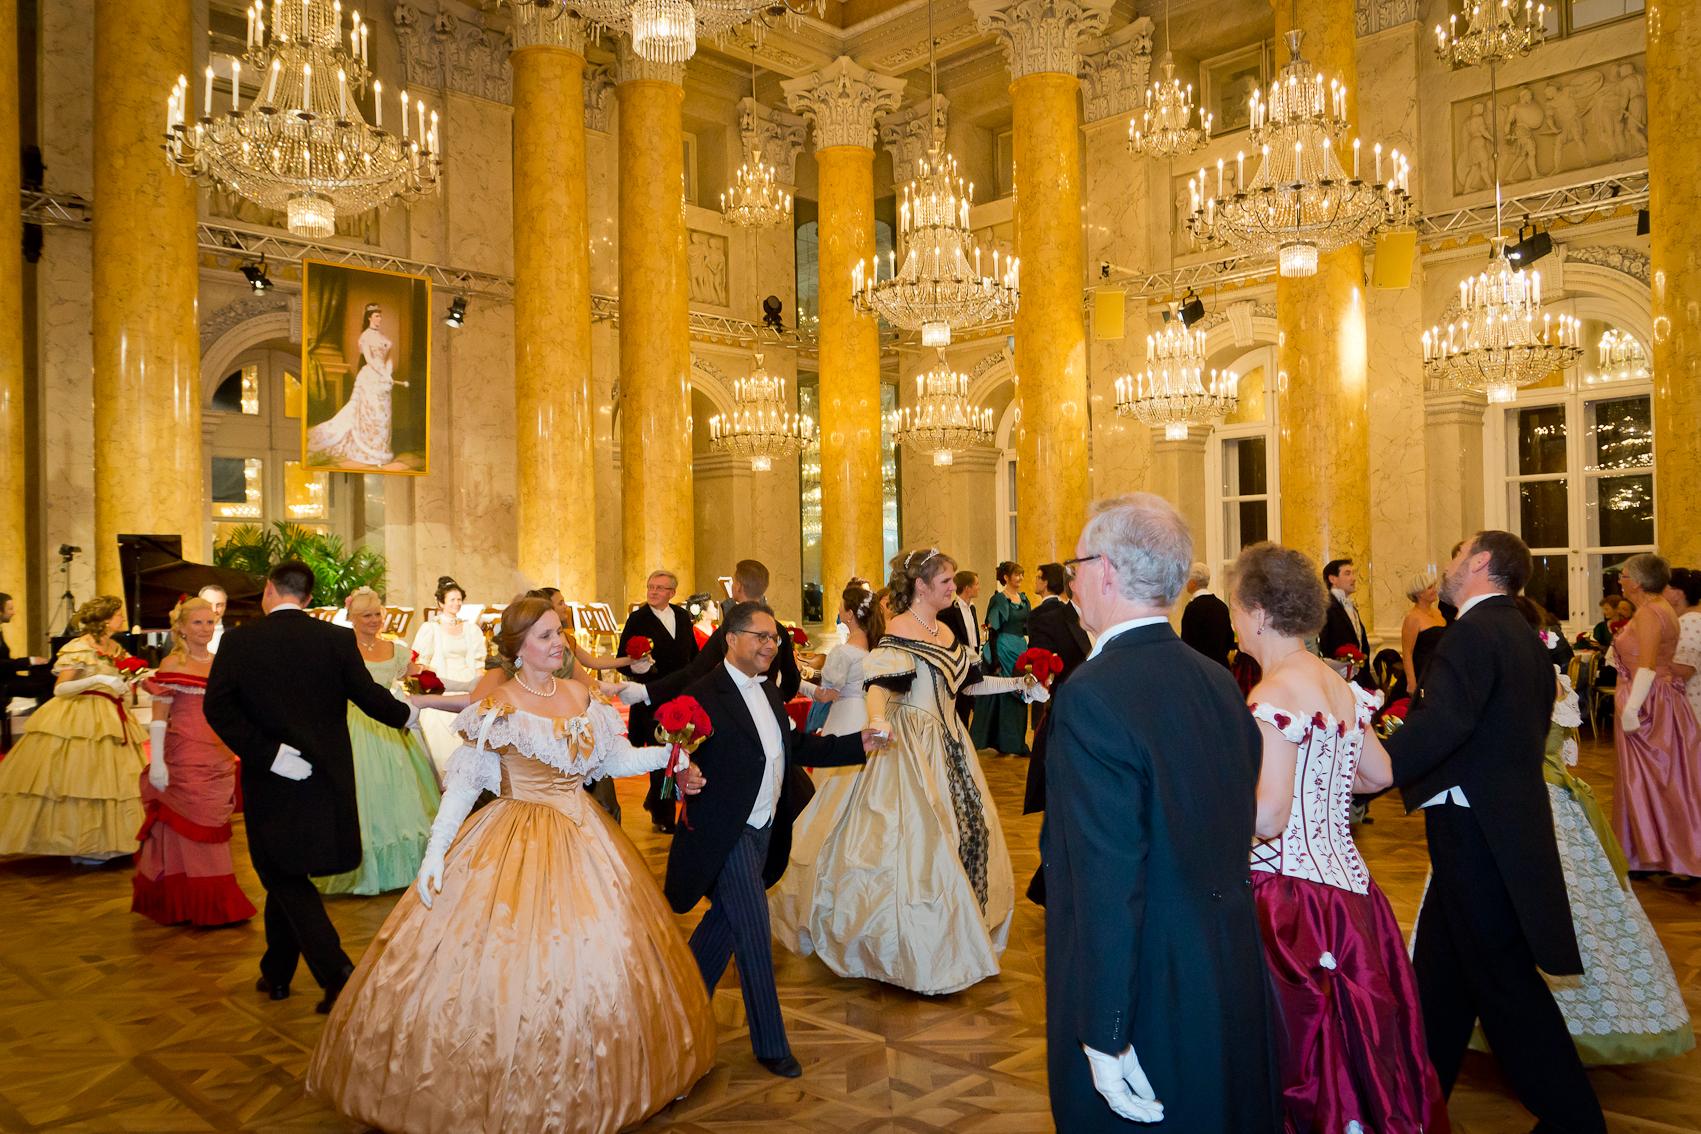 Tanzkurs für singles krefeld